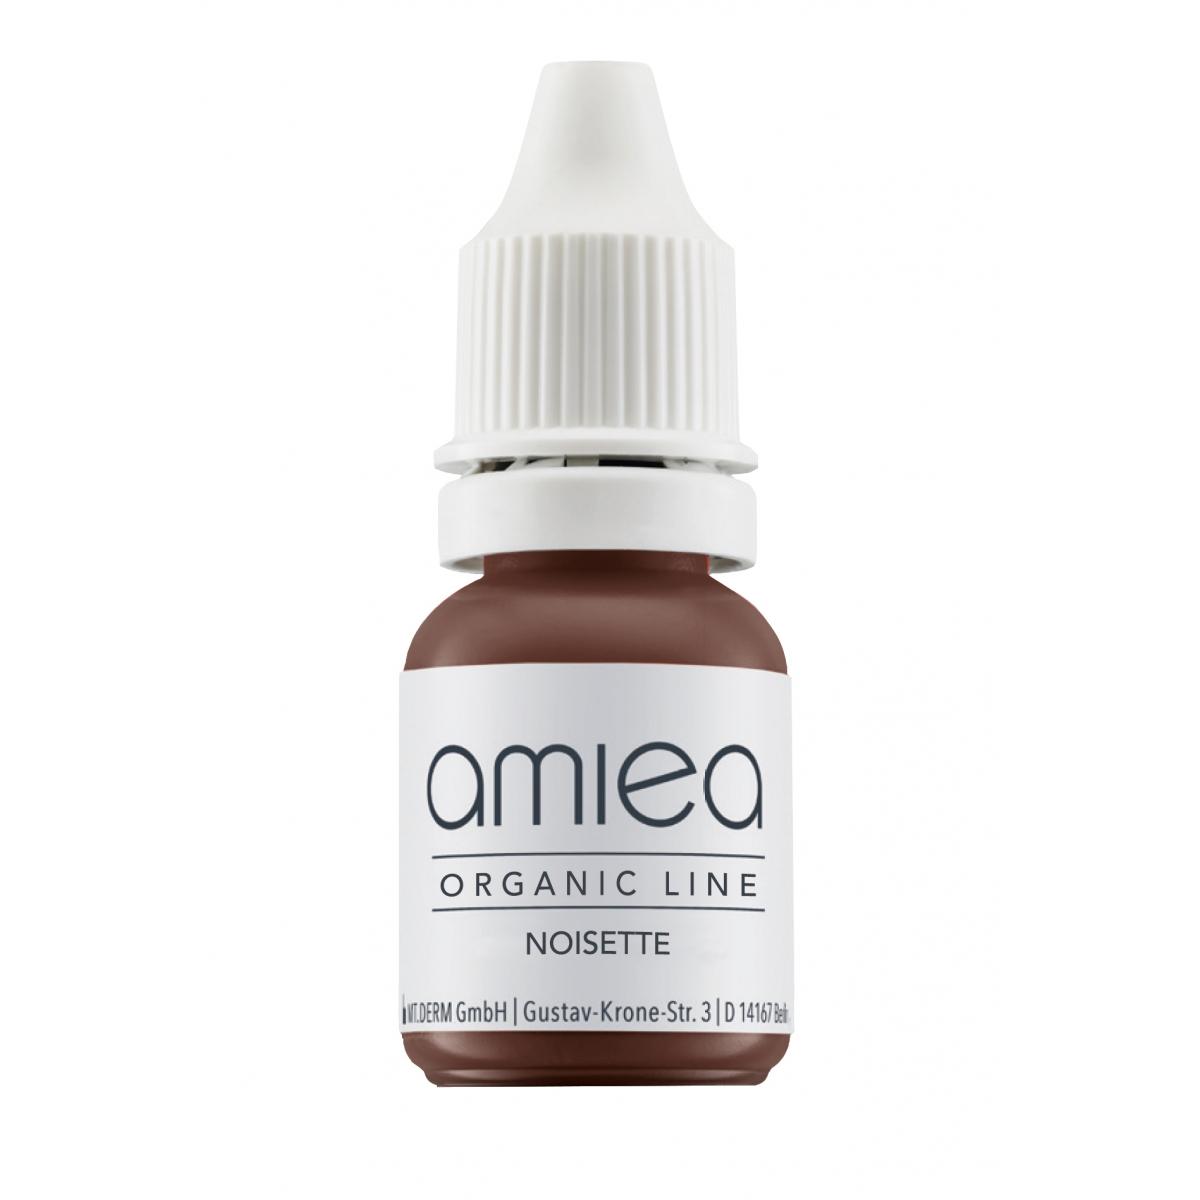 ORGANIC LINE (10ml) - PIGMENT NOISETTE ORGANICLINE AMIEA (10 ml)